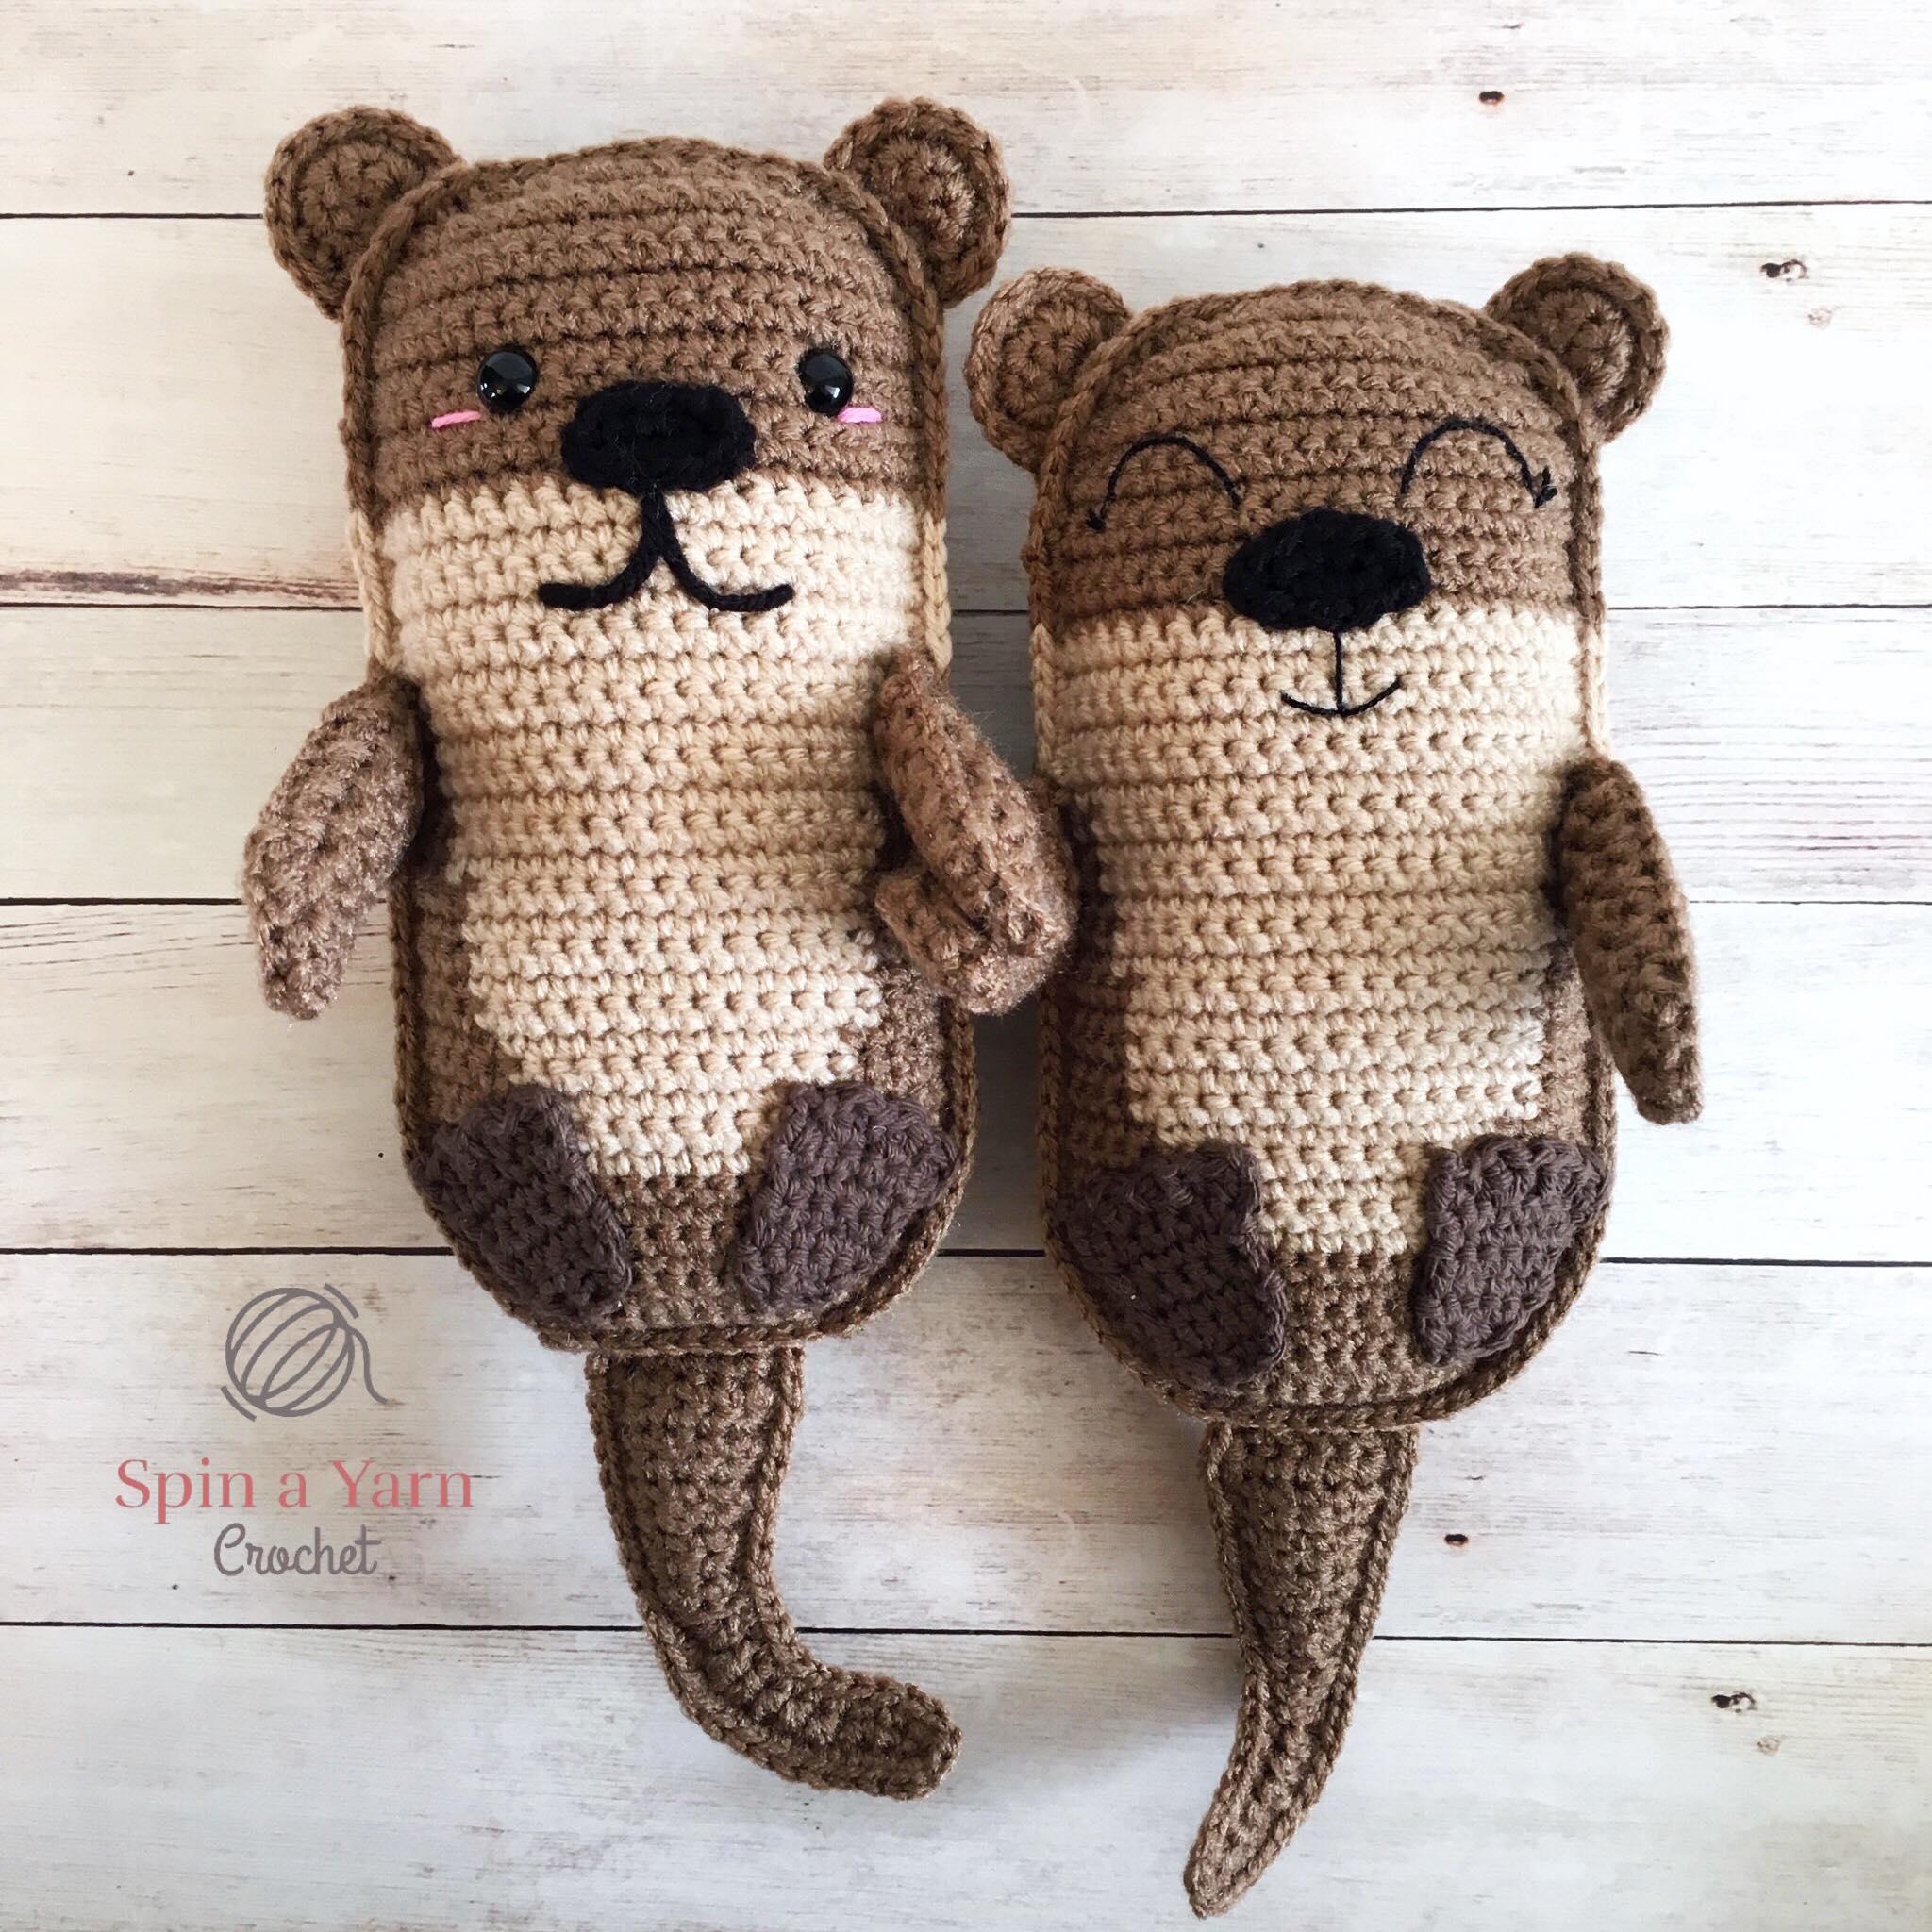 Niffler Premium Crochet Pattern, printable | Hooked by Kati | 2048x2048